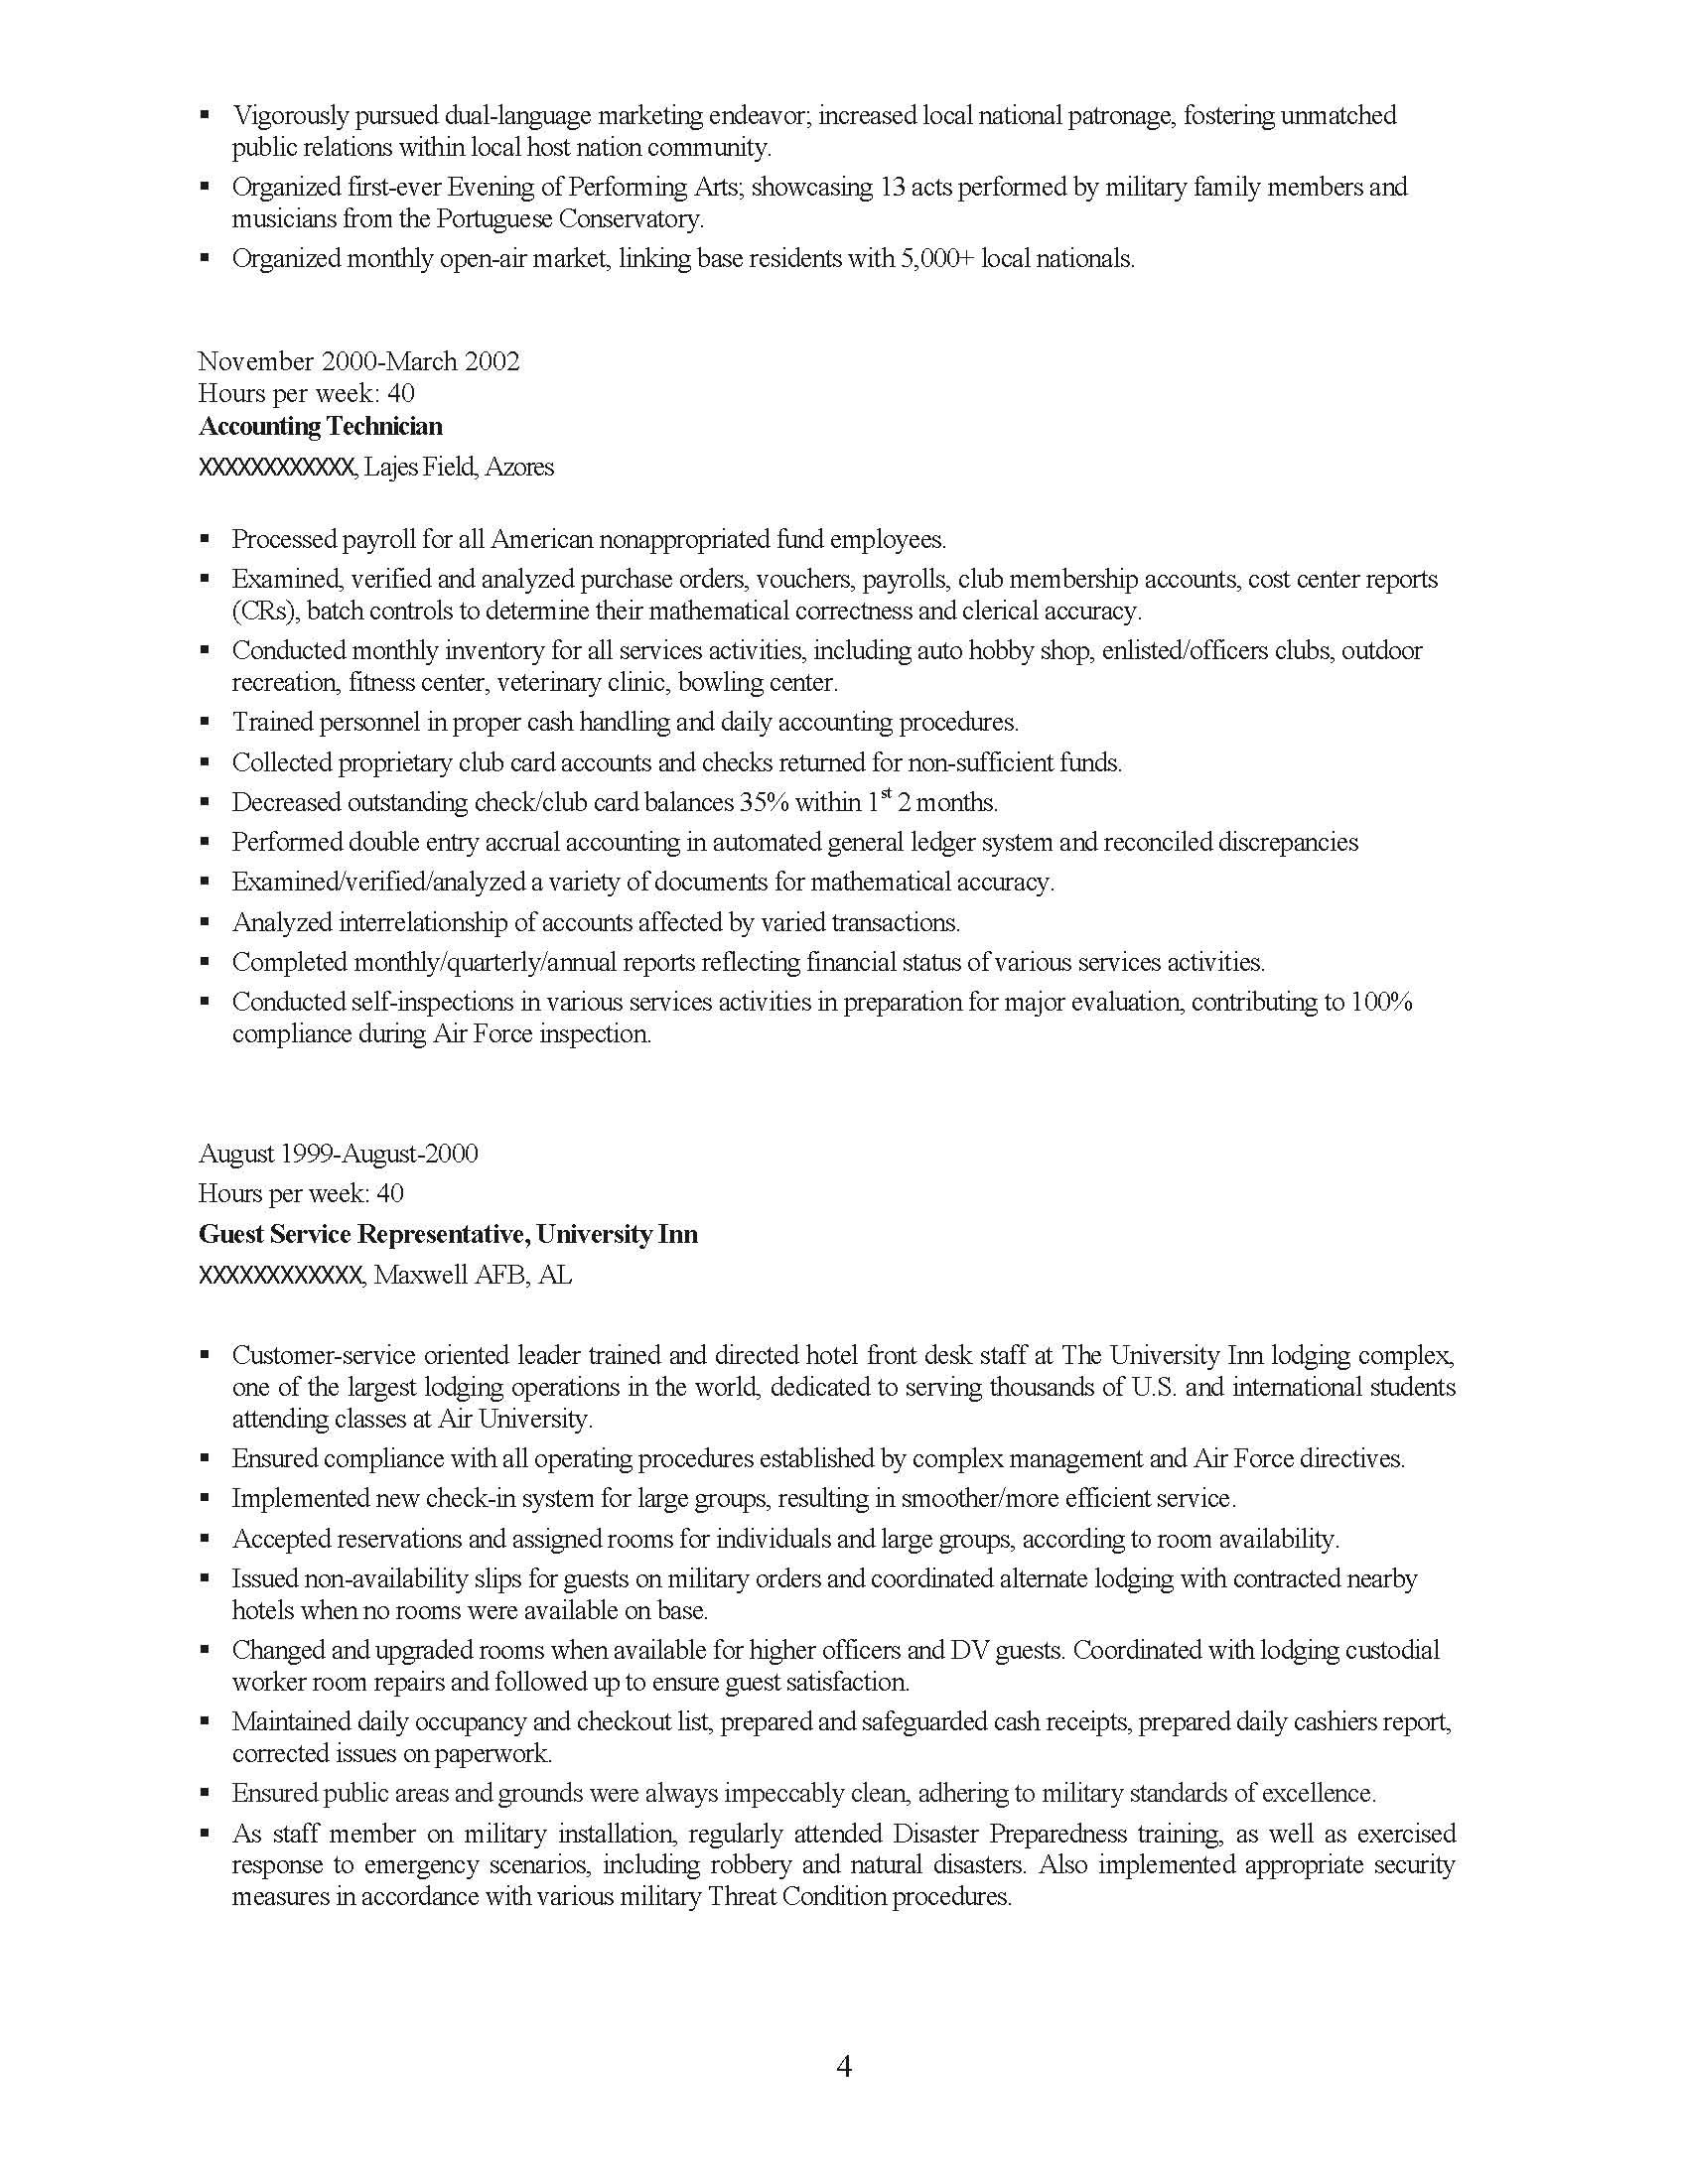 Senior Management Professional Resume Sample - Before-4